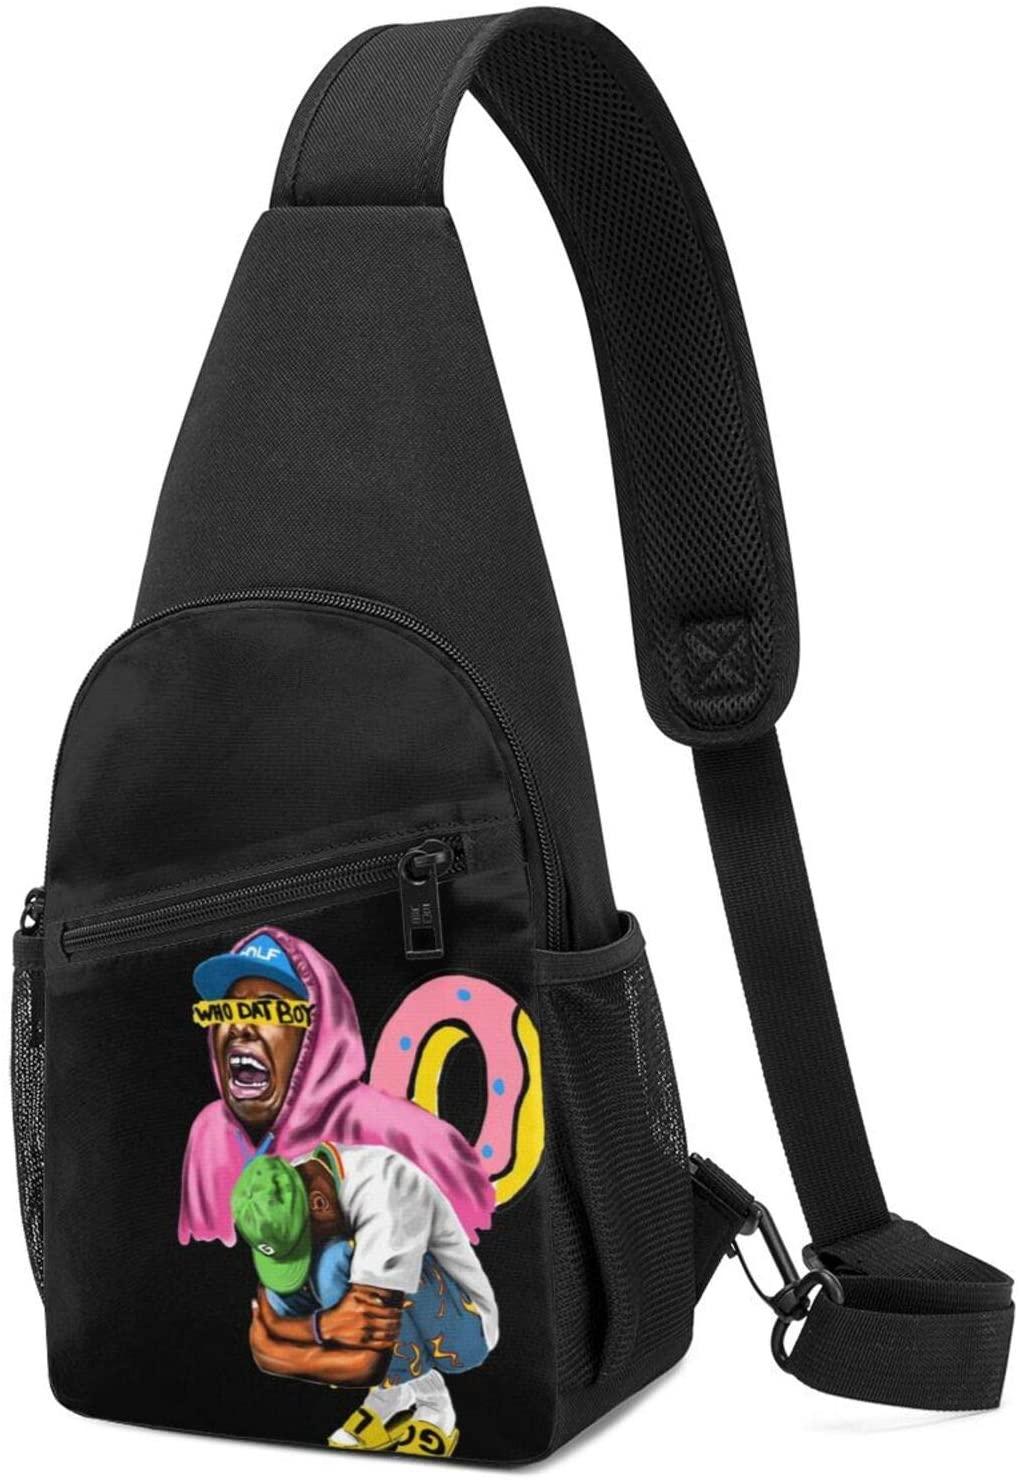 Golf Wang Tyler The Creator Rapfashion Travel Bag Chest Bag Shoulder Messenger Bag